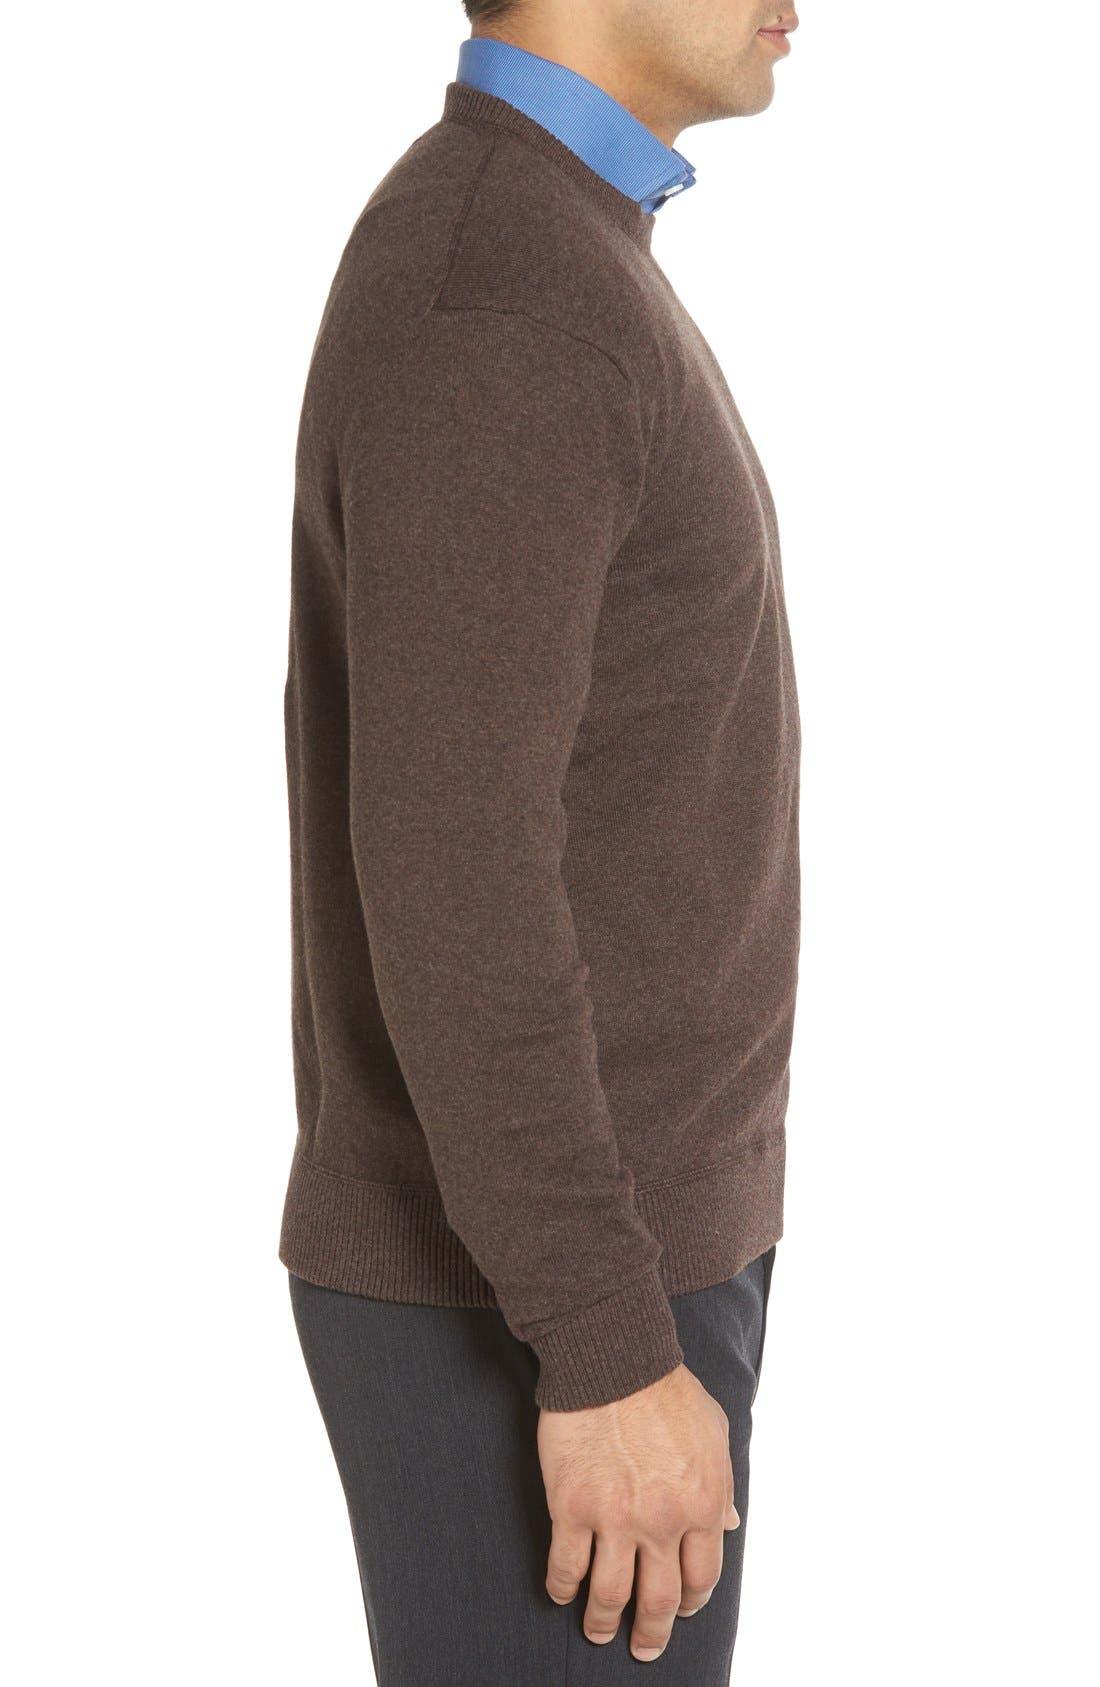 'Jersey Sport' Cotton Blend Crewneck Sweater,                             Alternate thumbnail 19, color,